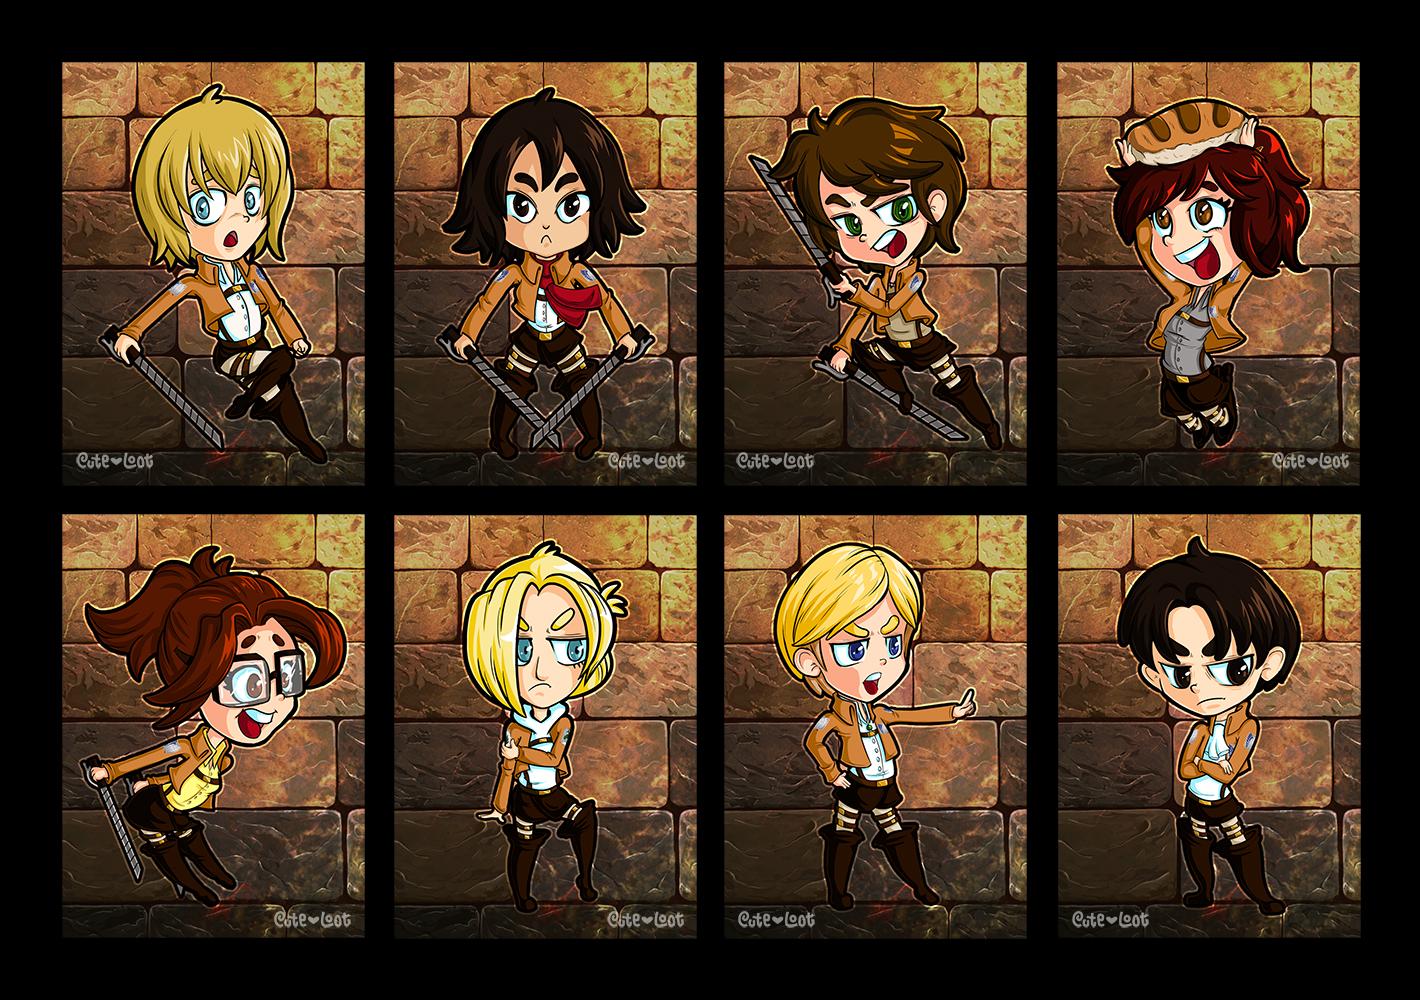 Attack On Titan Chibi Mini Prints By Cute Loot On Deviantart